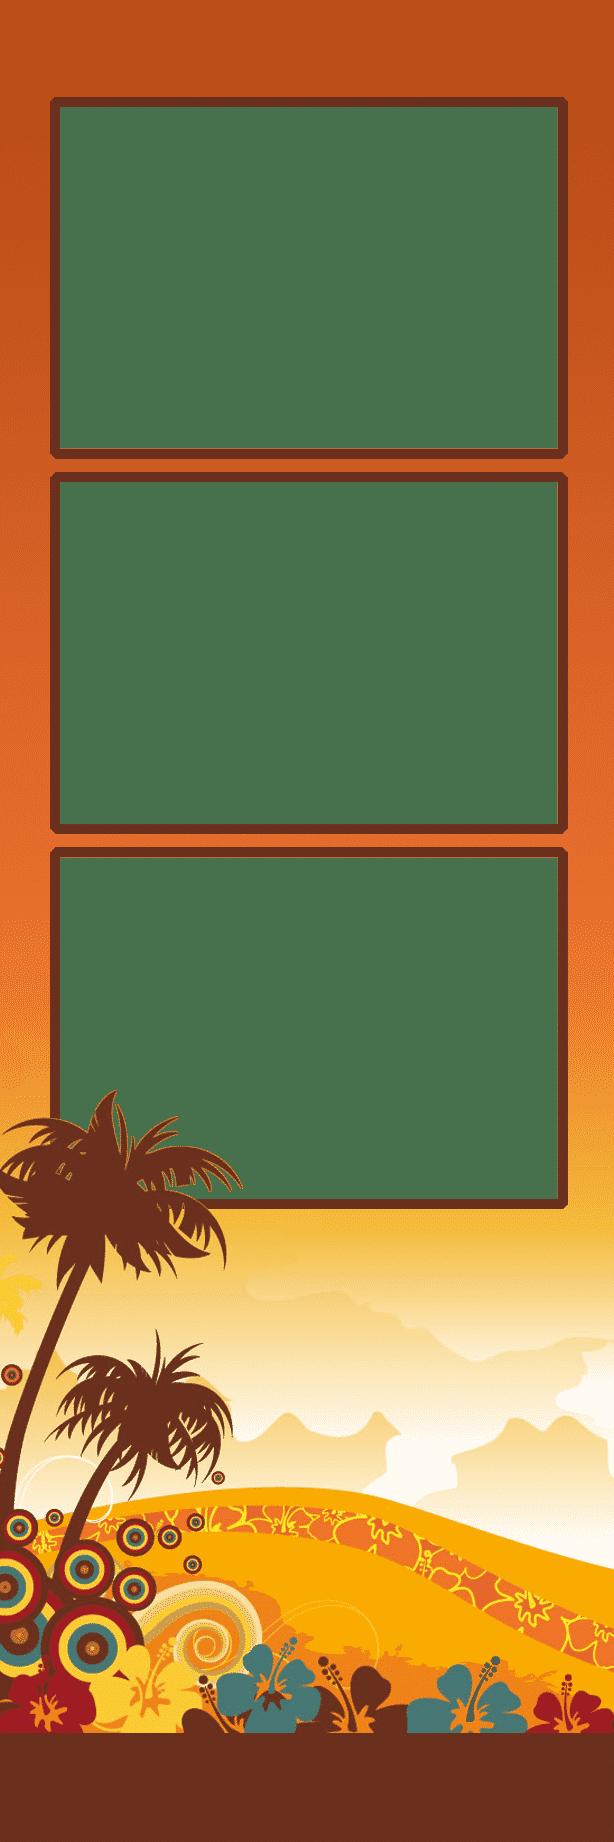 2075 - Sunset